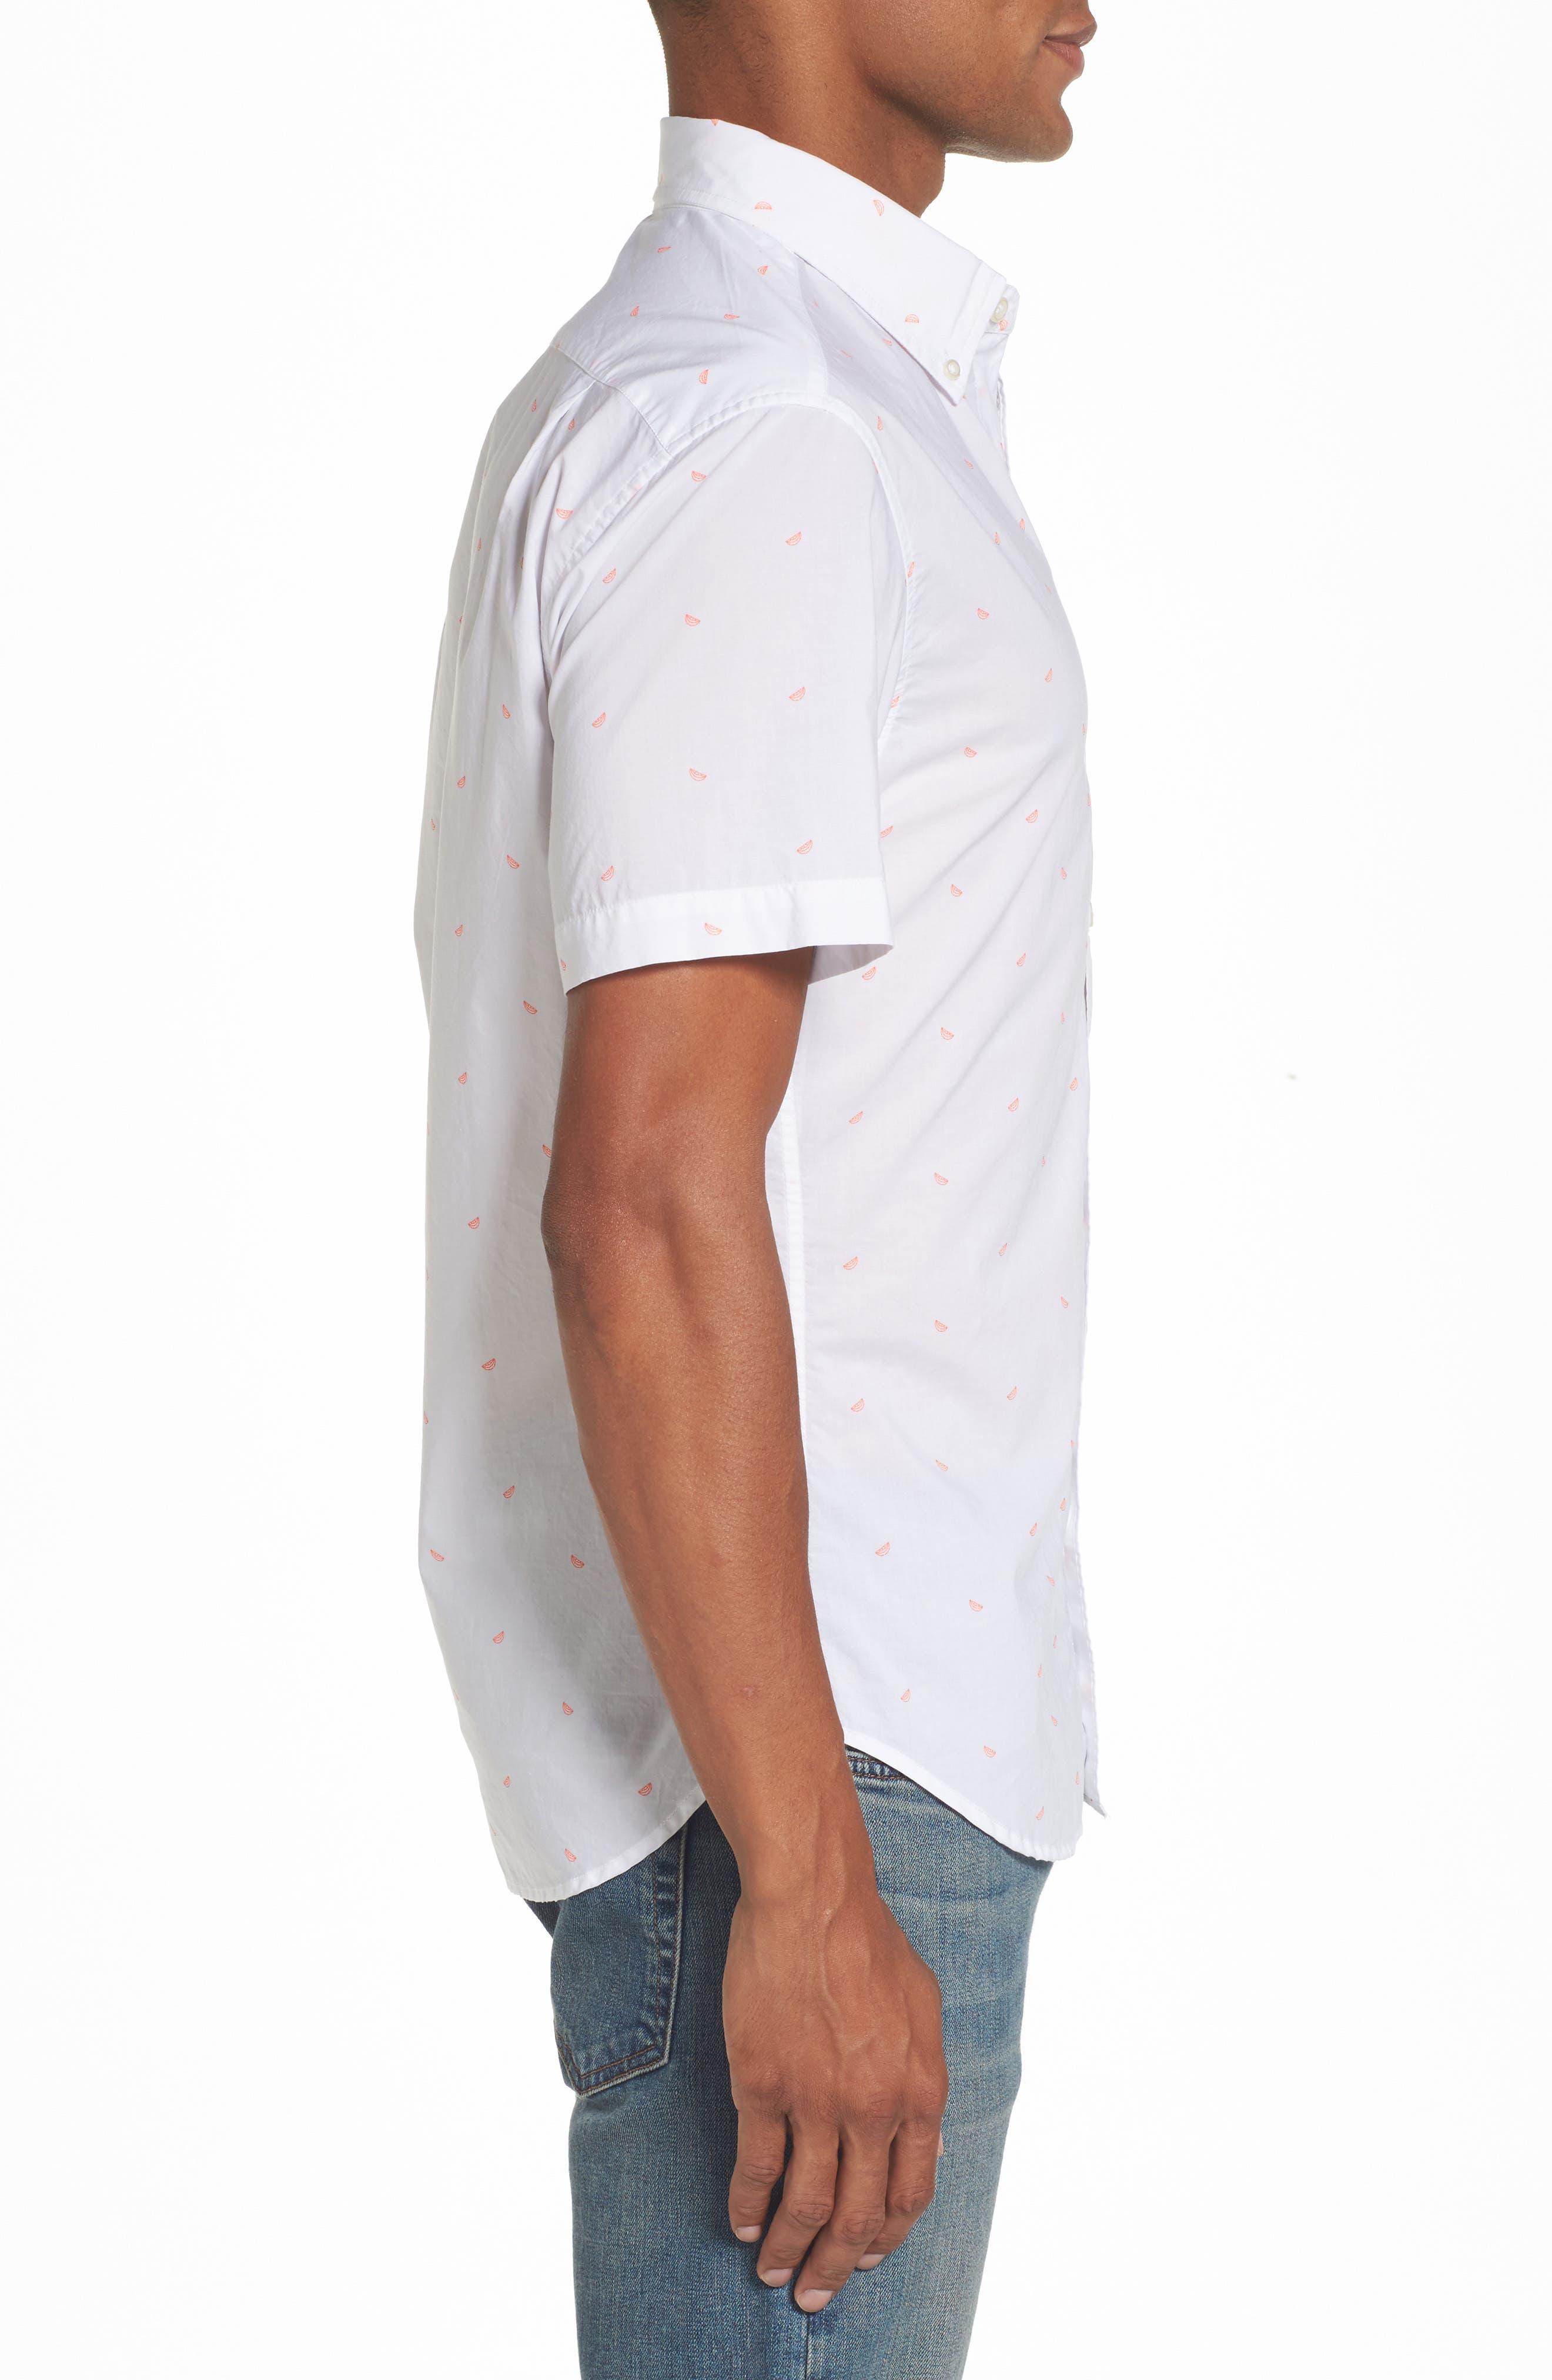 Riviera Slim Cut Citrus Woven Shirt,                             Alternate thumbnail 3, color,                             Lime Wedge Print